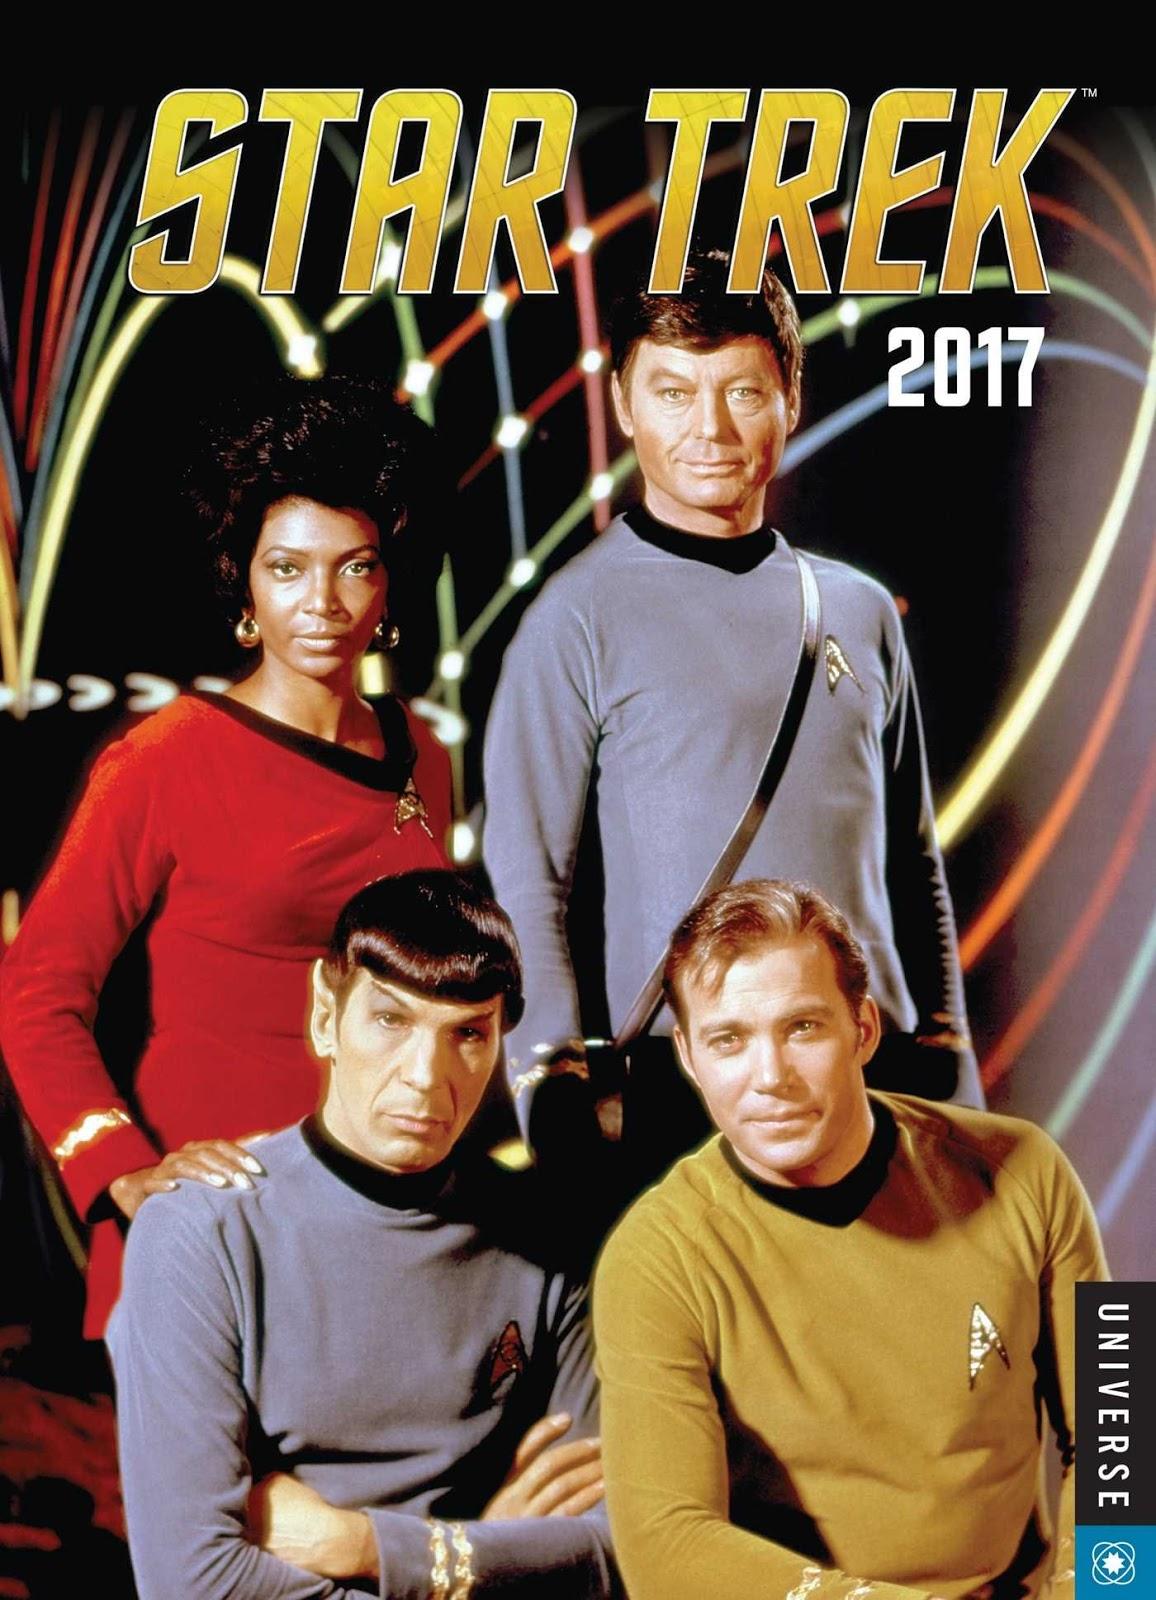 Trek Collective Lists: 2017 Star Trek calendars